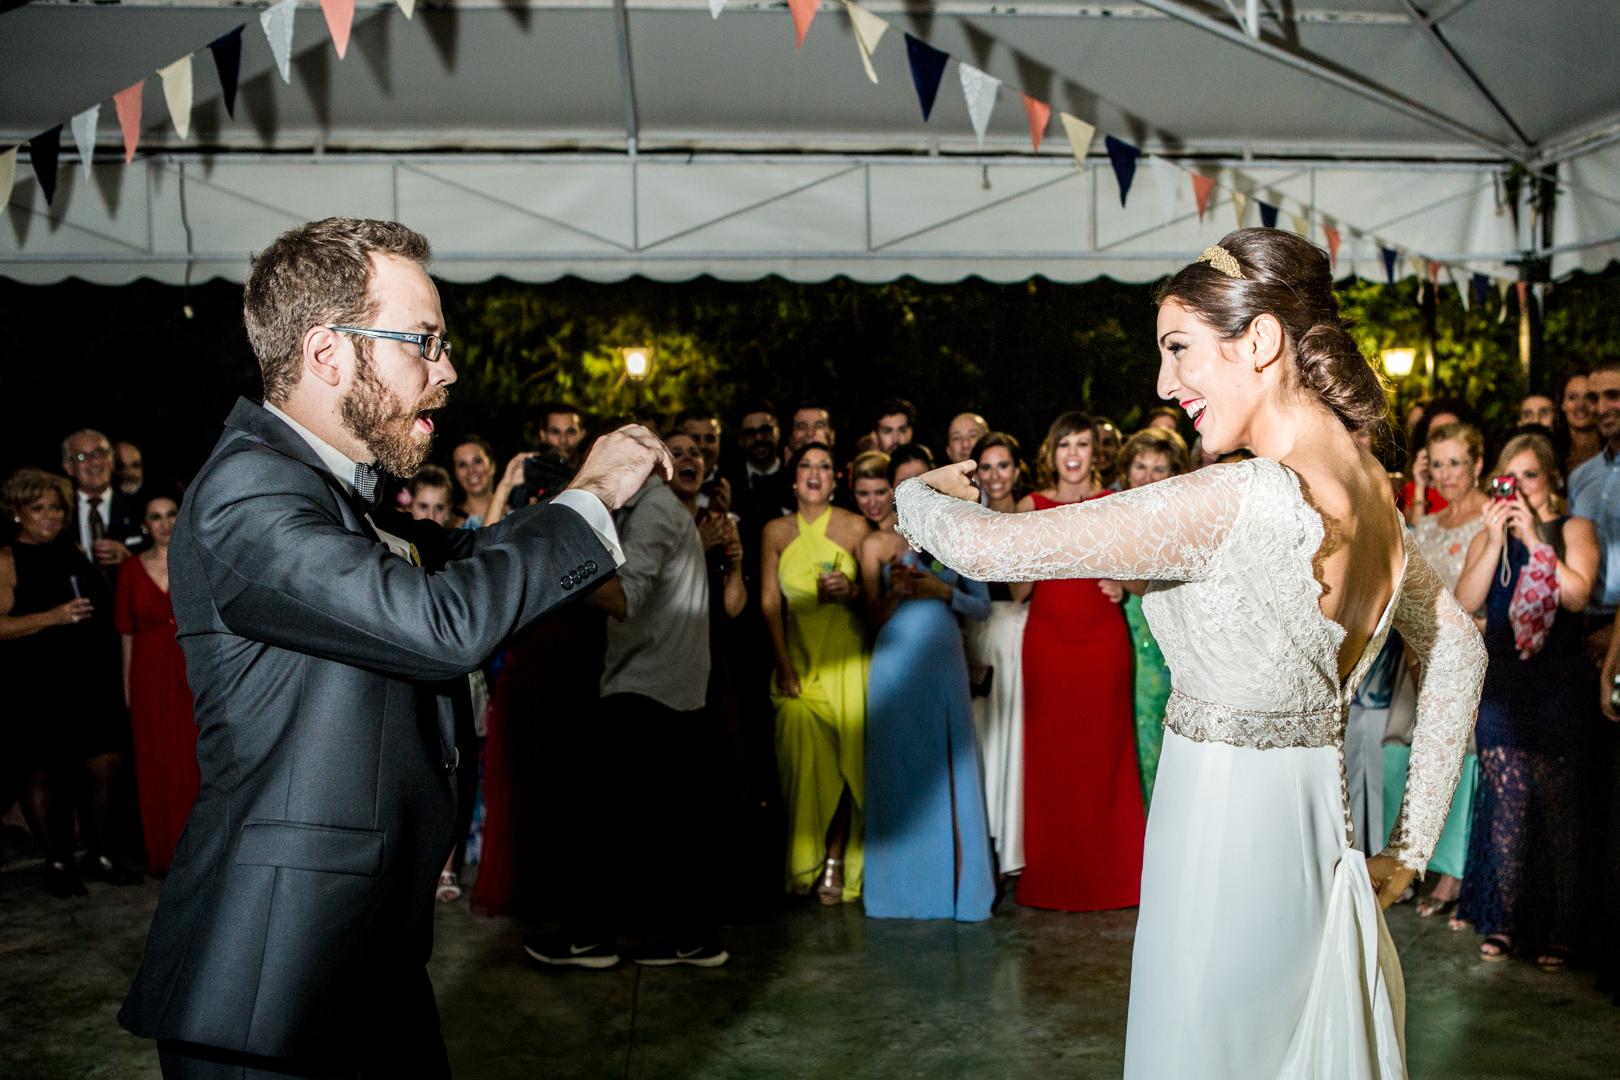 Boda-Sevilla-Museo-Carmona-Hamburgo-Maria-Carles-engagement-Rafael-Torres-fotografo-bodas-sevilla-madrid-barcelona-wedding-photographer--39.jpg